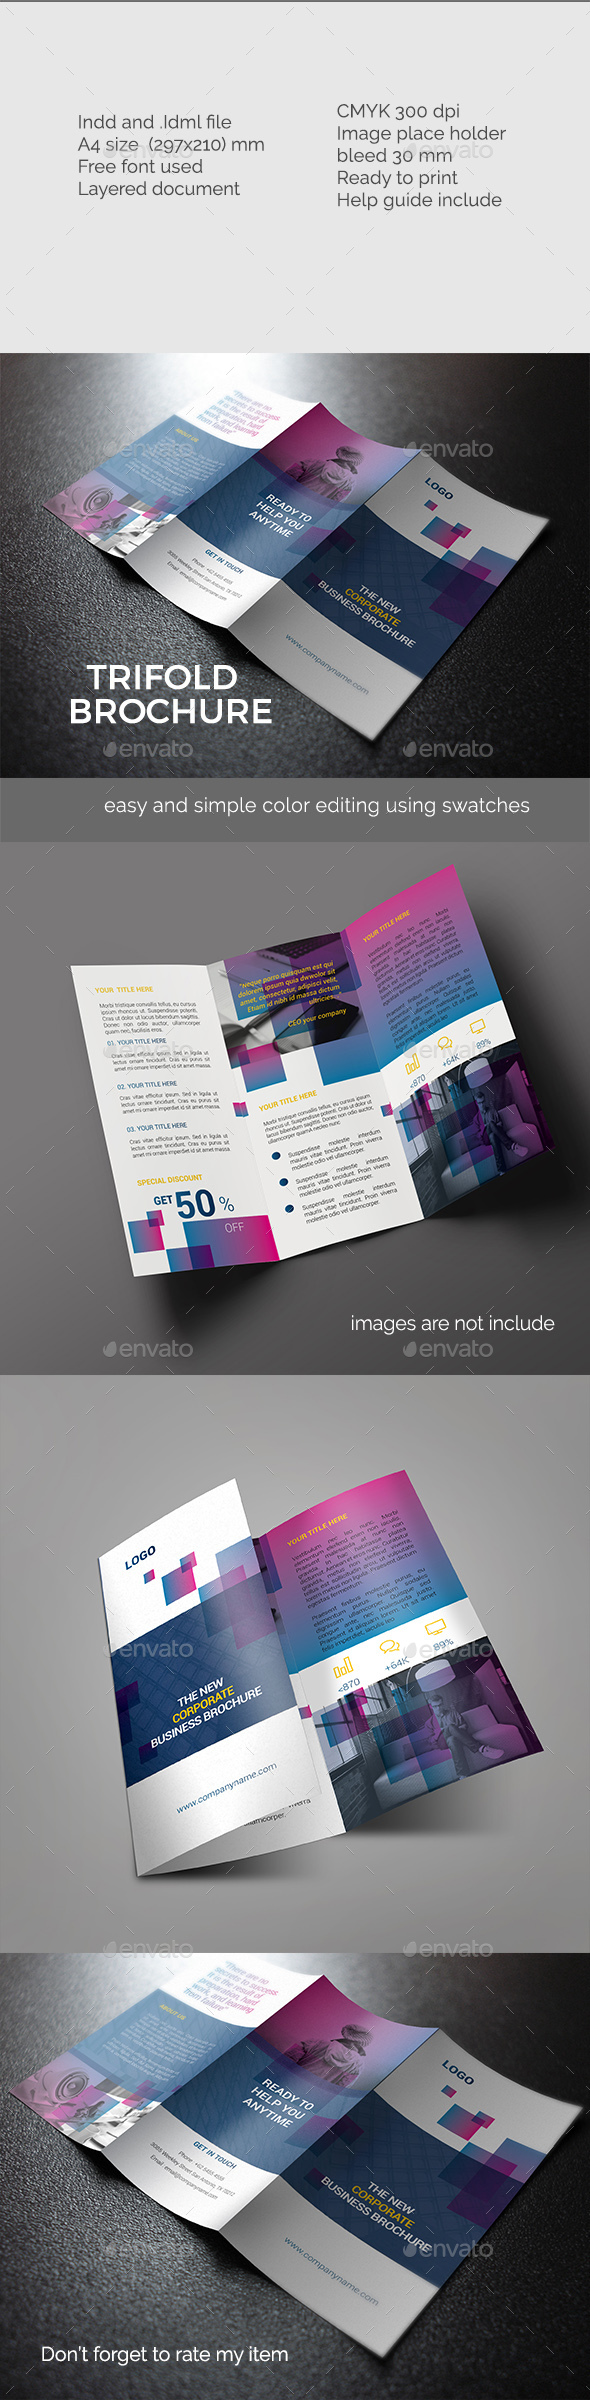 Elegant Trifold Brochure  - Corporate Brochures